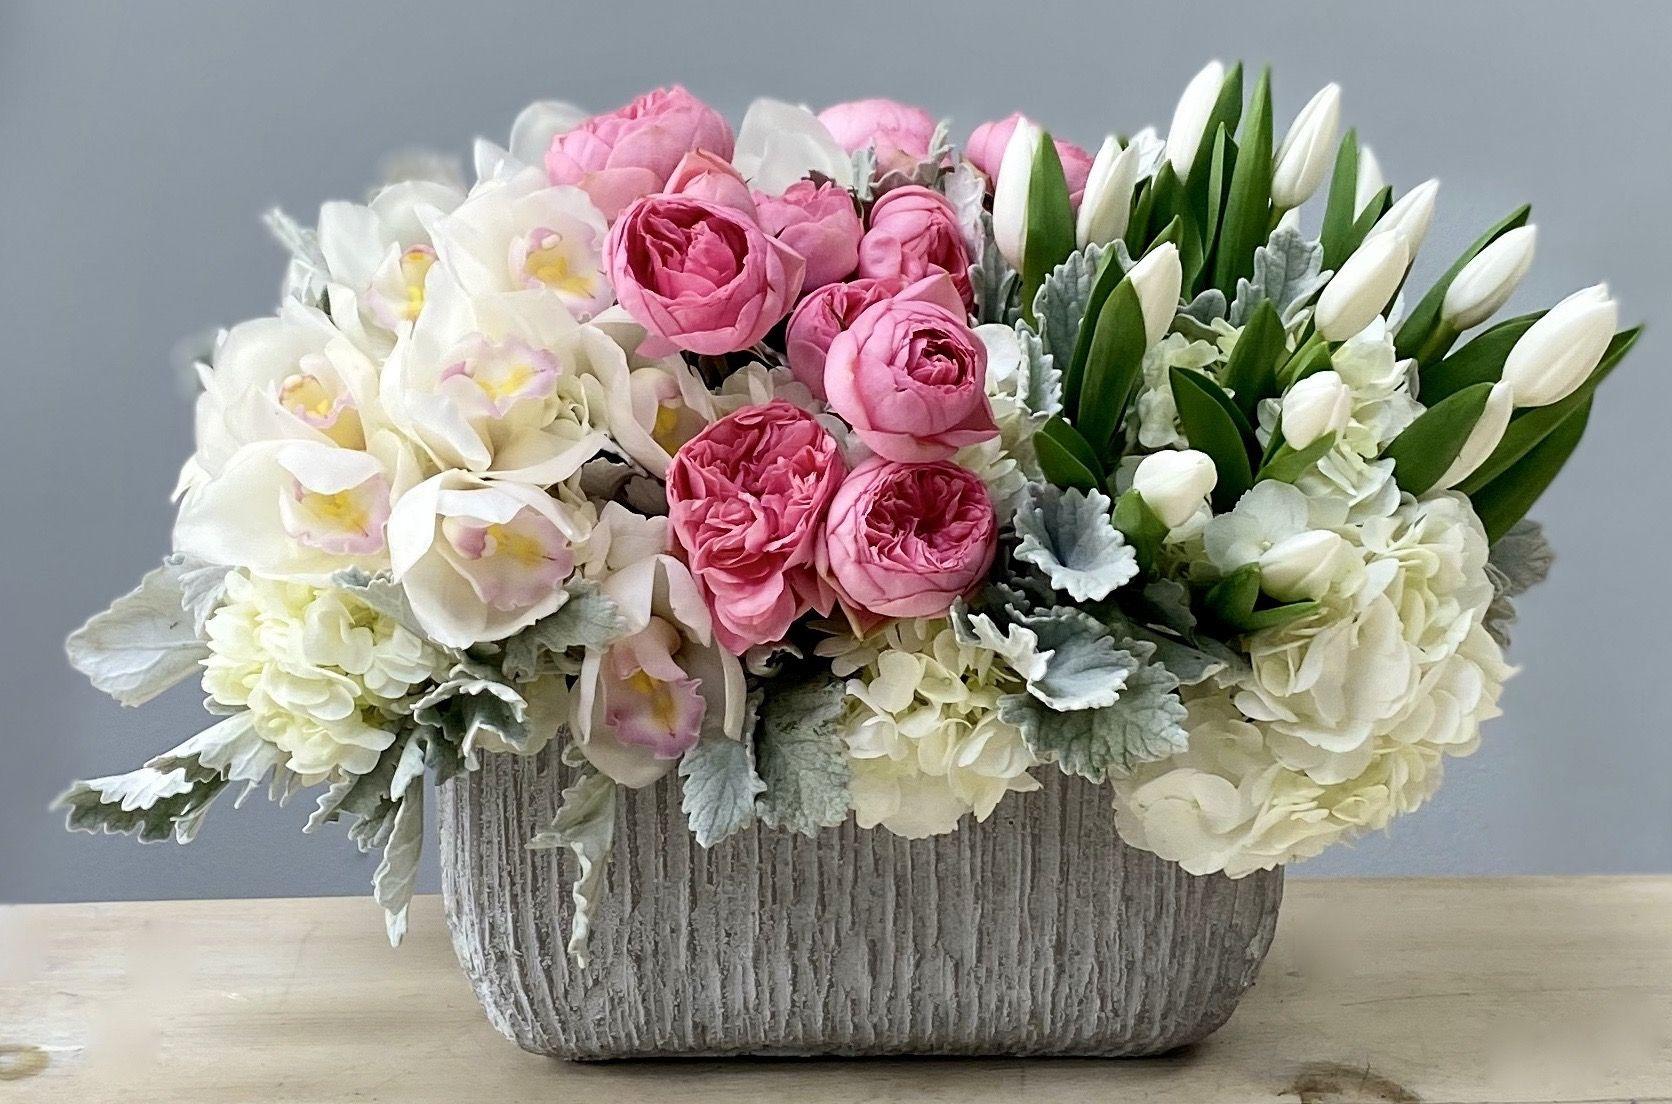 Delivery in LA!- Myglendaleflorist #flowers #gardenroses #tulips #floralarrangement #arrangement #LA #myglendaleflorist #birthday #giftiedas #specialevents